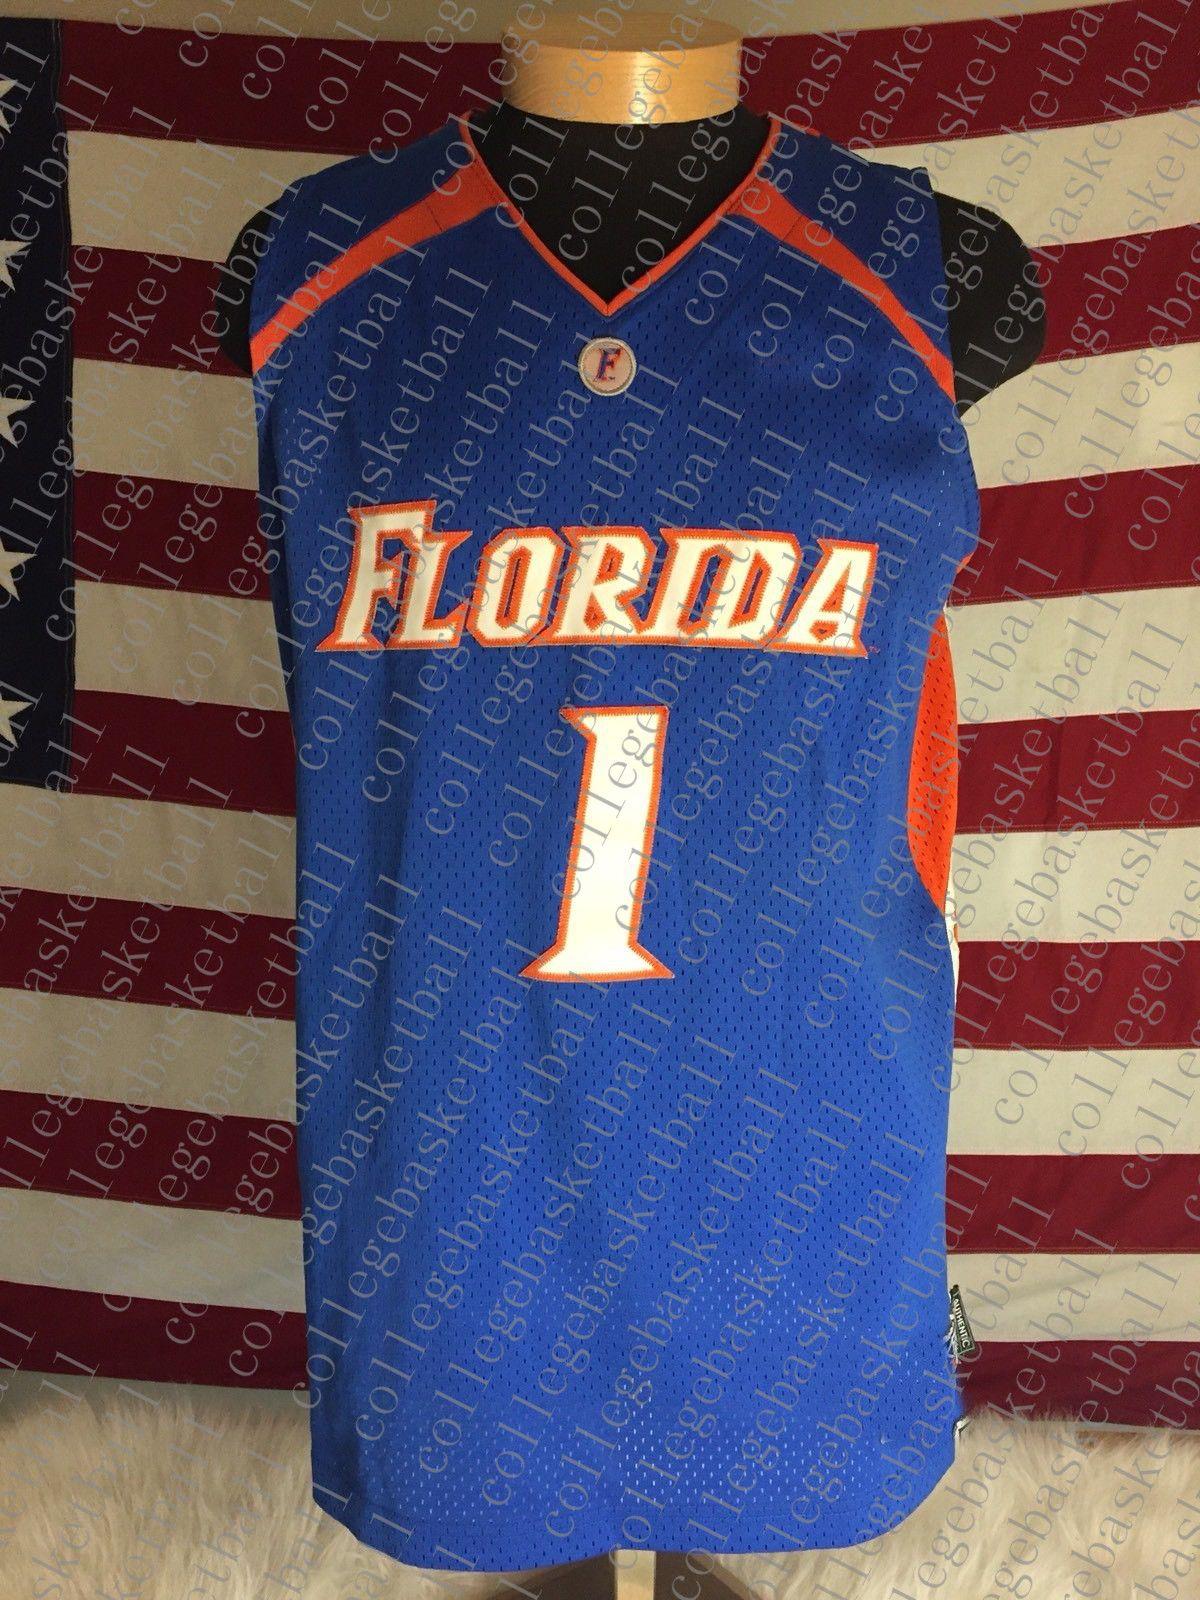 Cheap custom Florida Gators Blue Orange Basketball Jersey #1 Stitched Customize any number name MEN WOMEN YOUTH XS-5XL